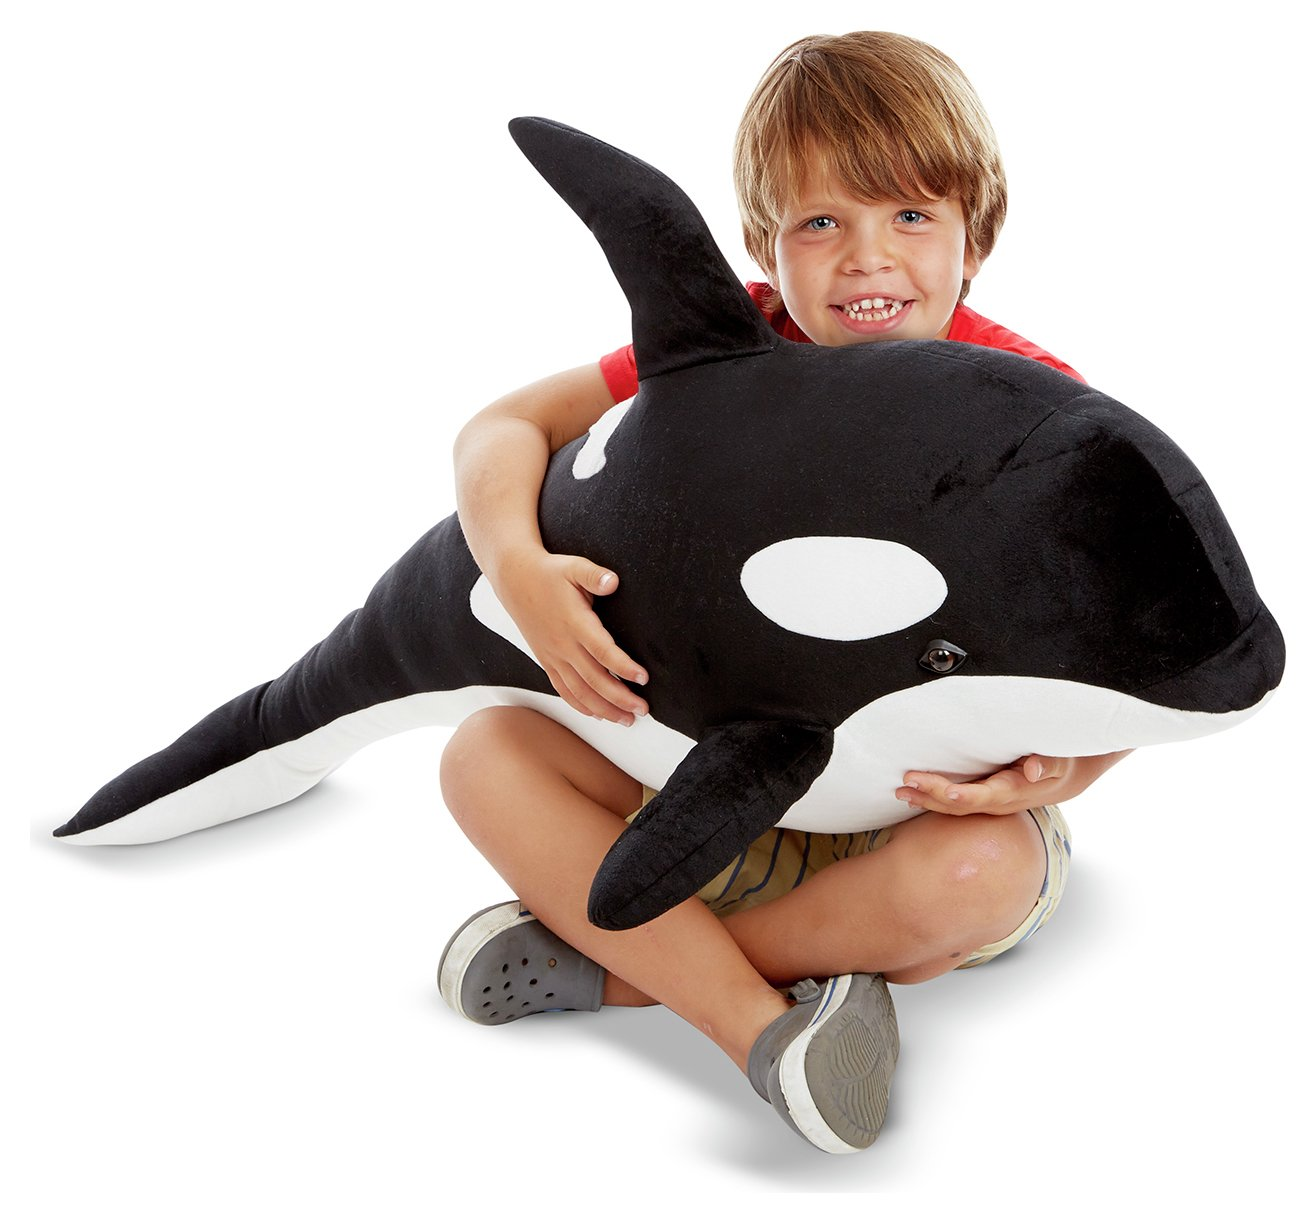 Melissa & doug Orca Soft Toy - Giant